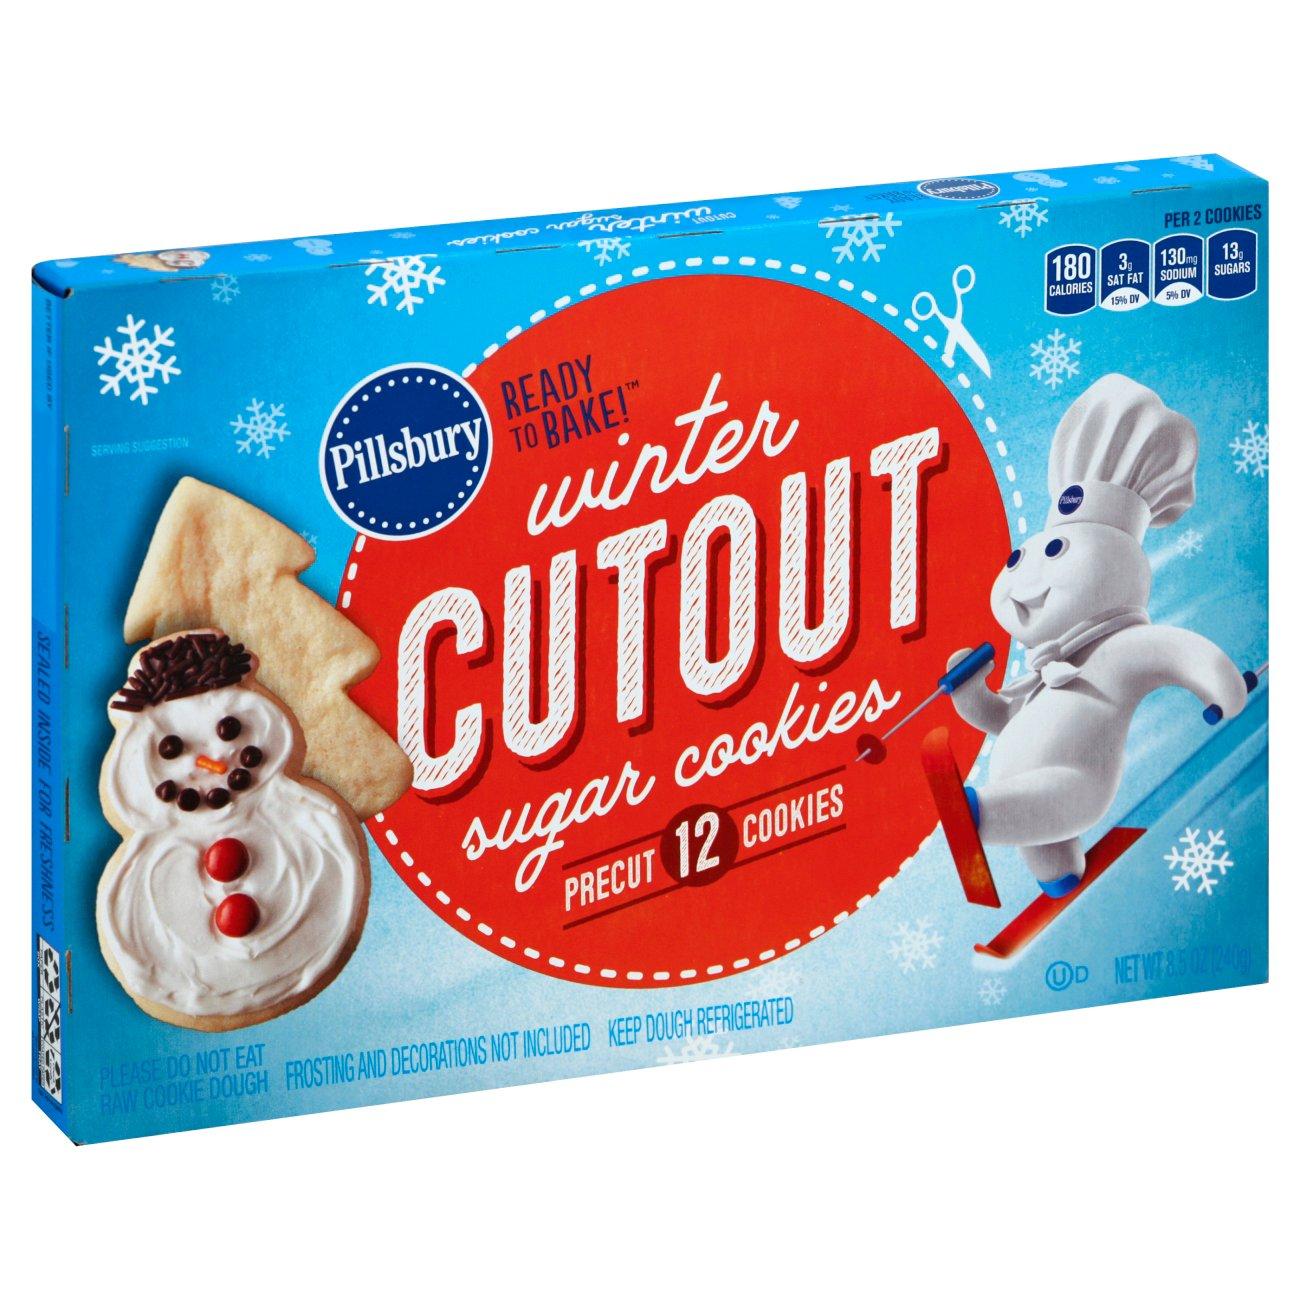 Pillsbury Christmas Cookies.Pillsbury Winter Holiday Pre Cut Sugar Cookies